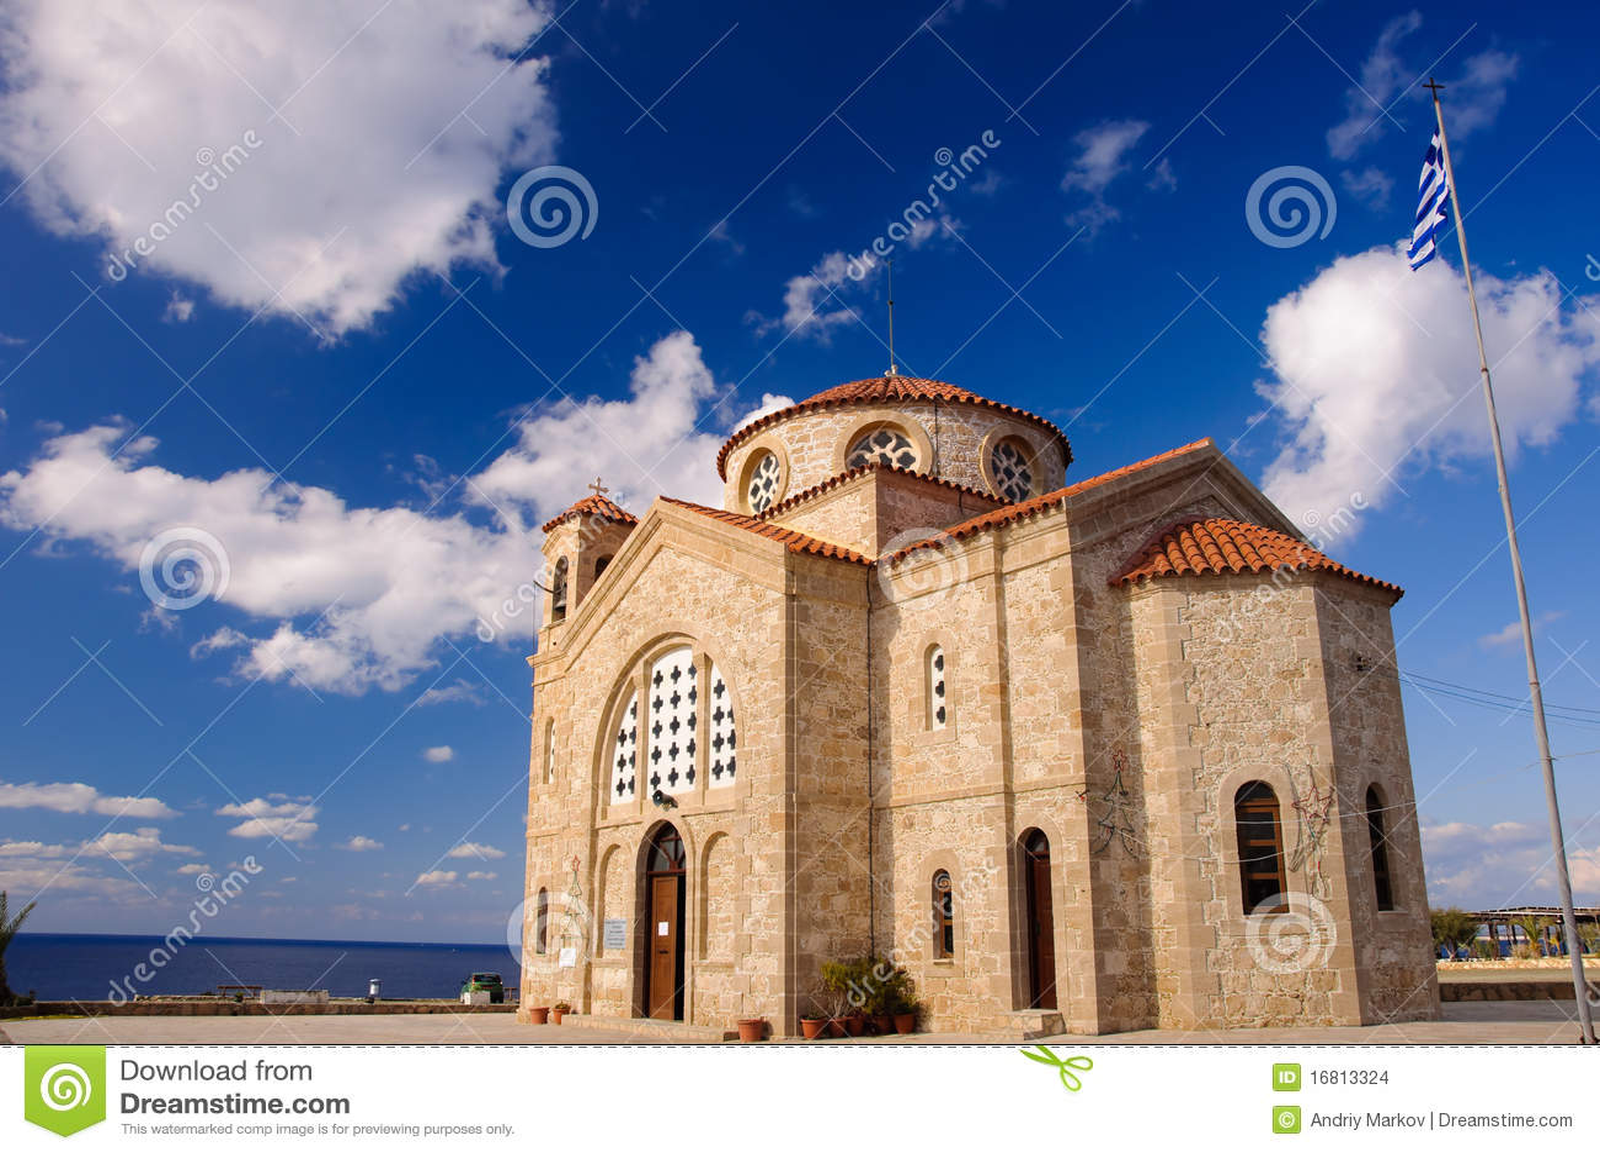 Agios Georgios Church Stock Images - Image: 16813324